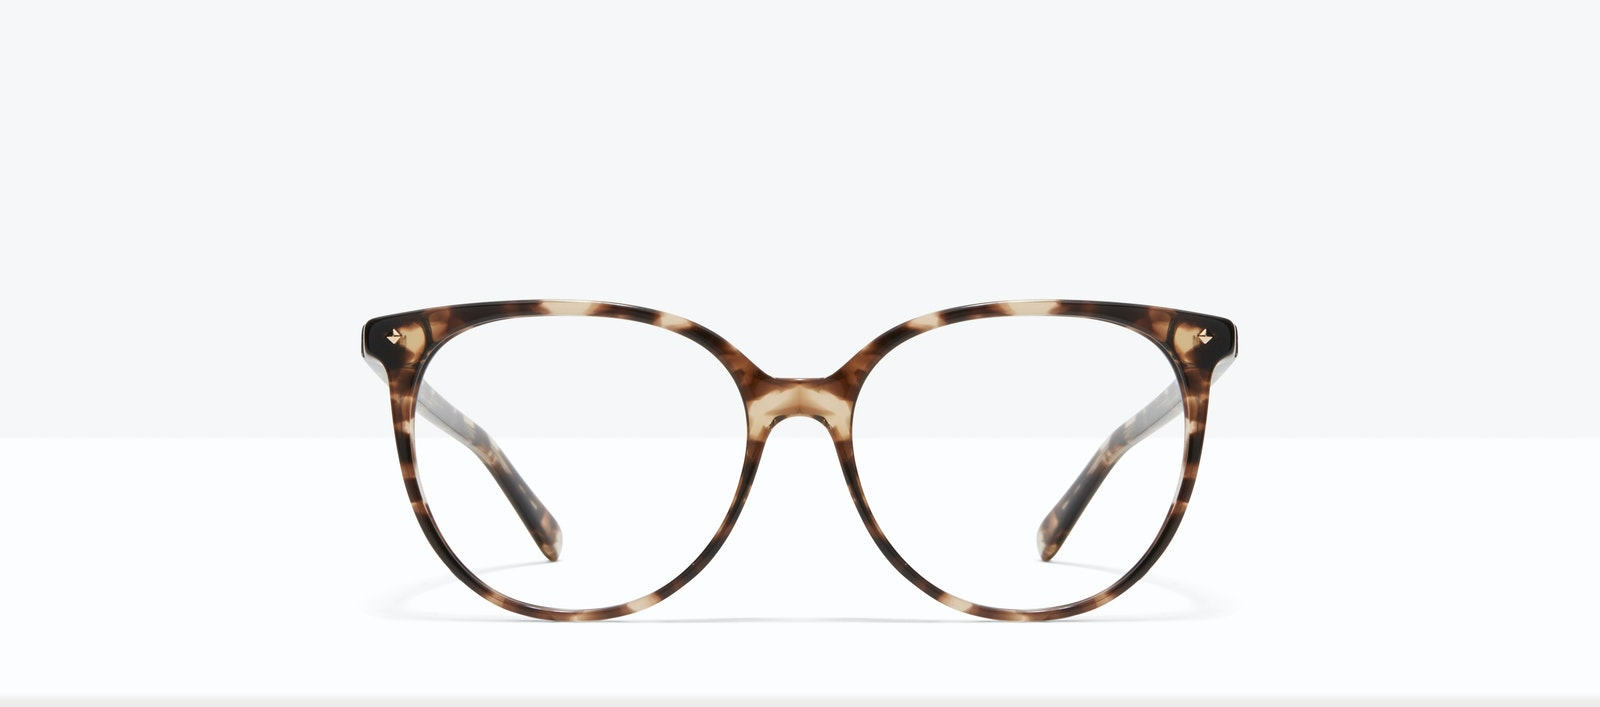 Affordable Fashion Glasses Round Eyeglasses Women Area L Leopard Front